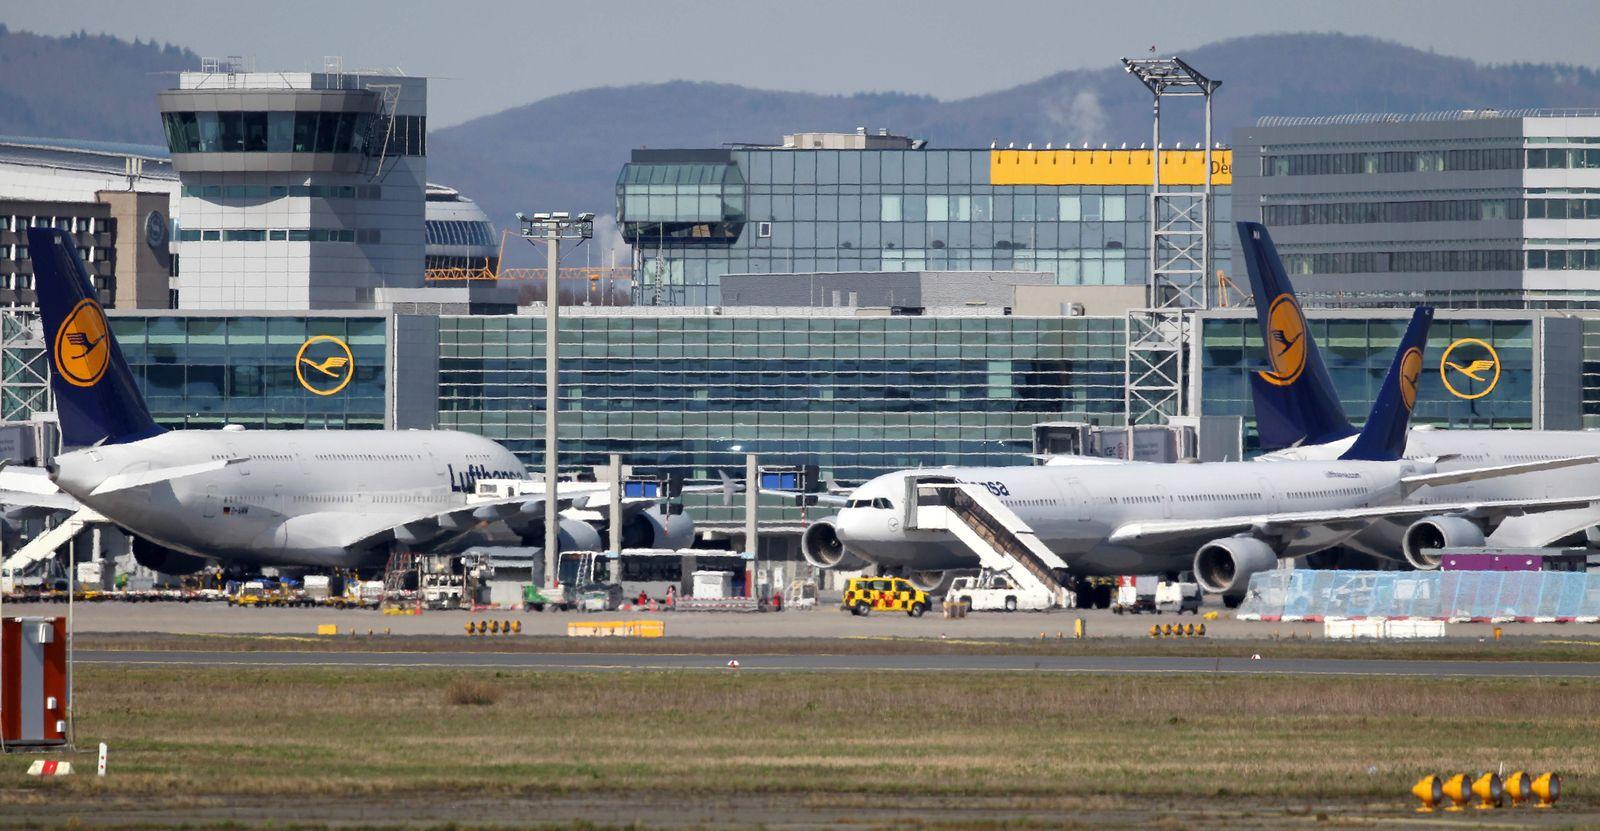 FILES-GERMANY-HEALTH-VIRUS-AIRPORT-AVIATION-CUTS